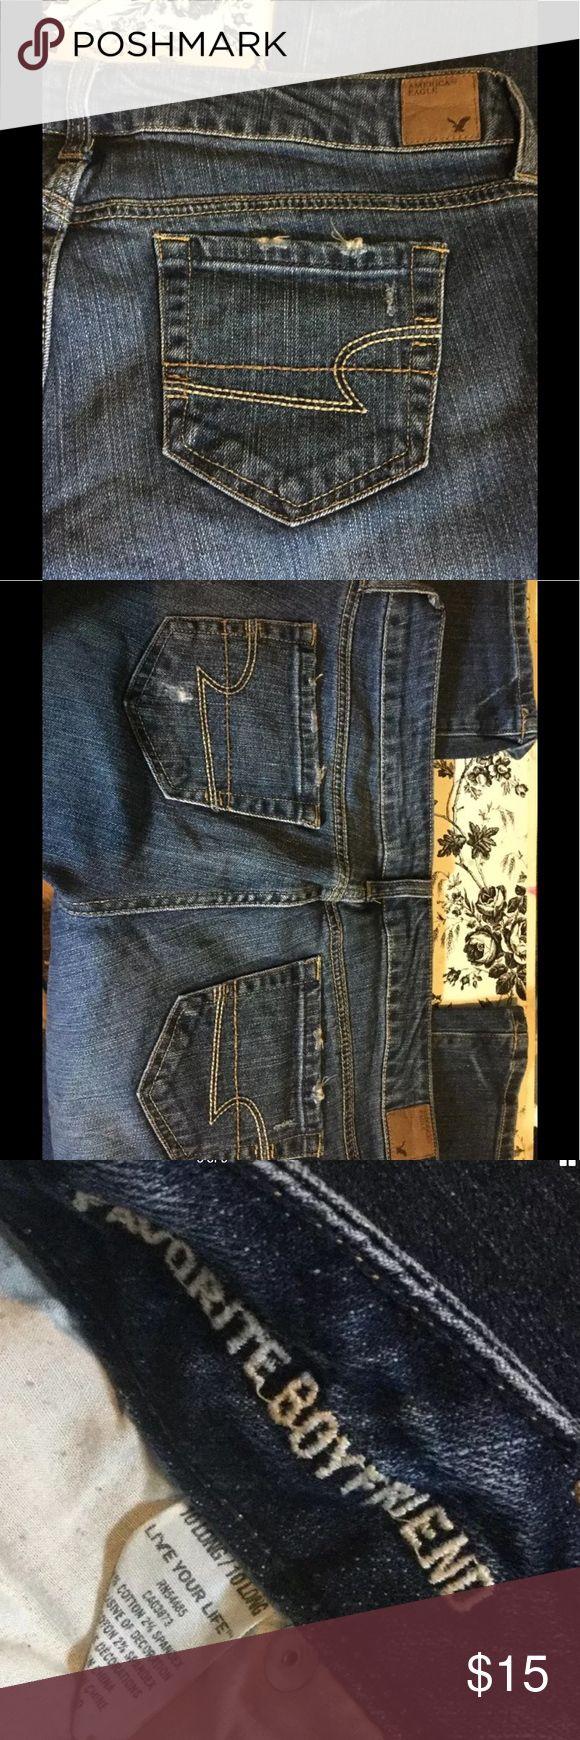 10 Long Tall Favorite Boyfriend Jeans American Eagle Outfitters AEO Ladies sz 10 Long Tall Favorite Boyfriend Jeans 35W34L American Eagle Outfitters Jeans Boyfriend